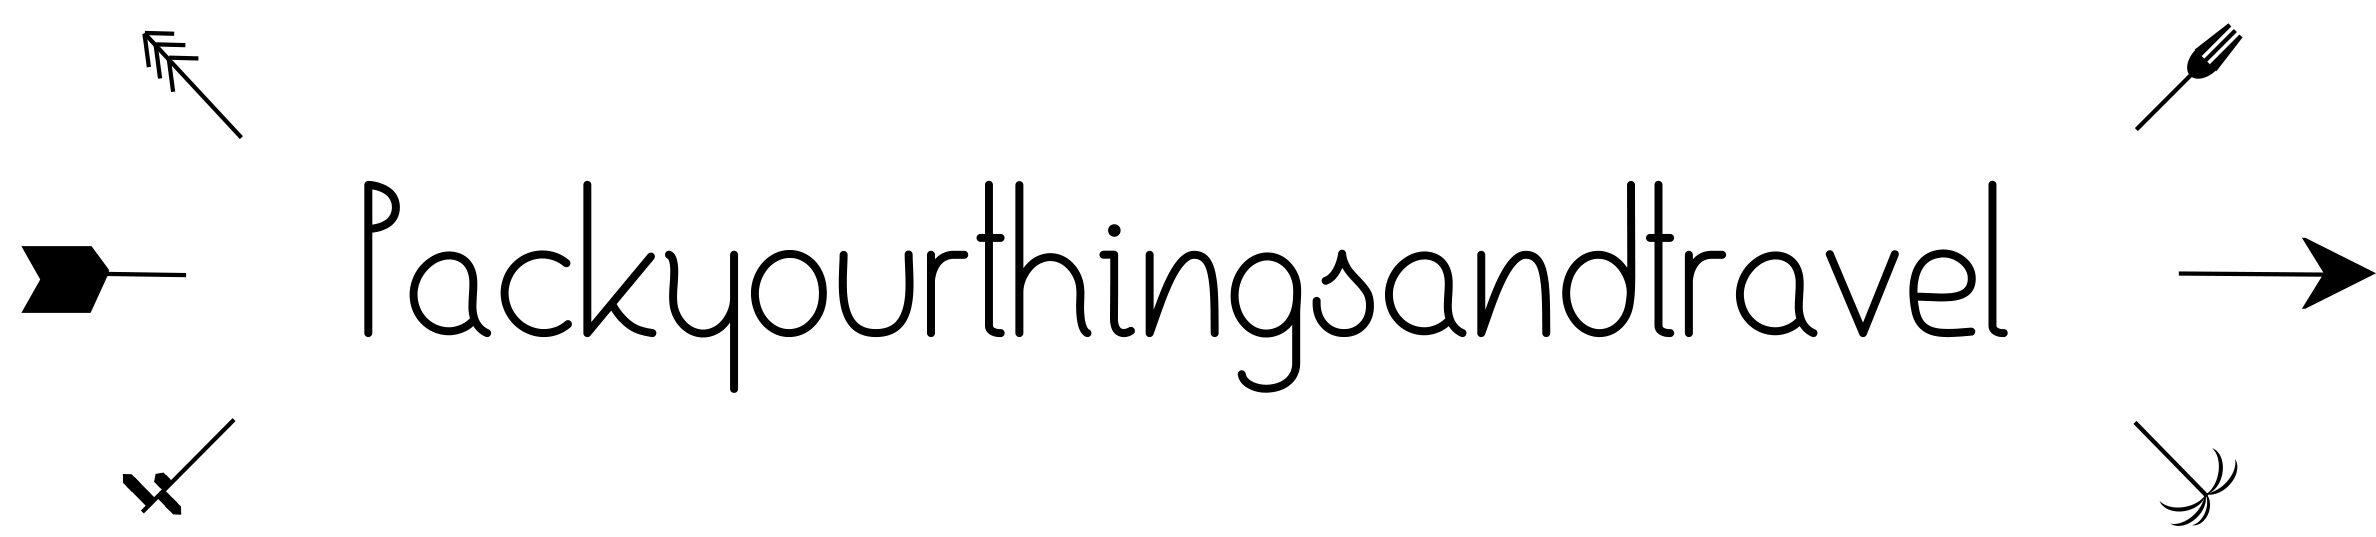 packyourthingsandtravel logo